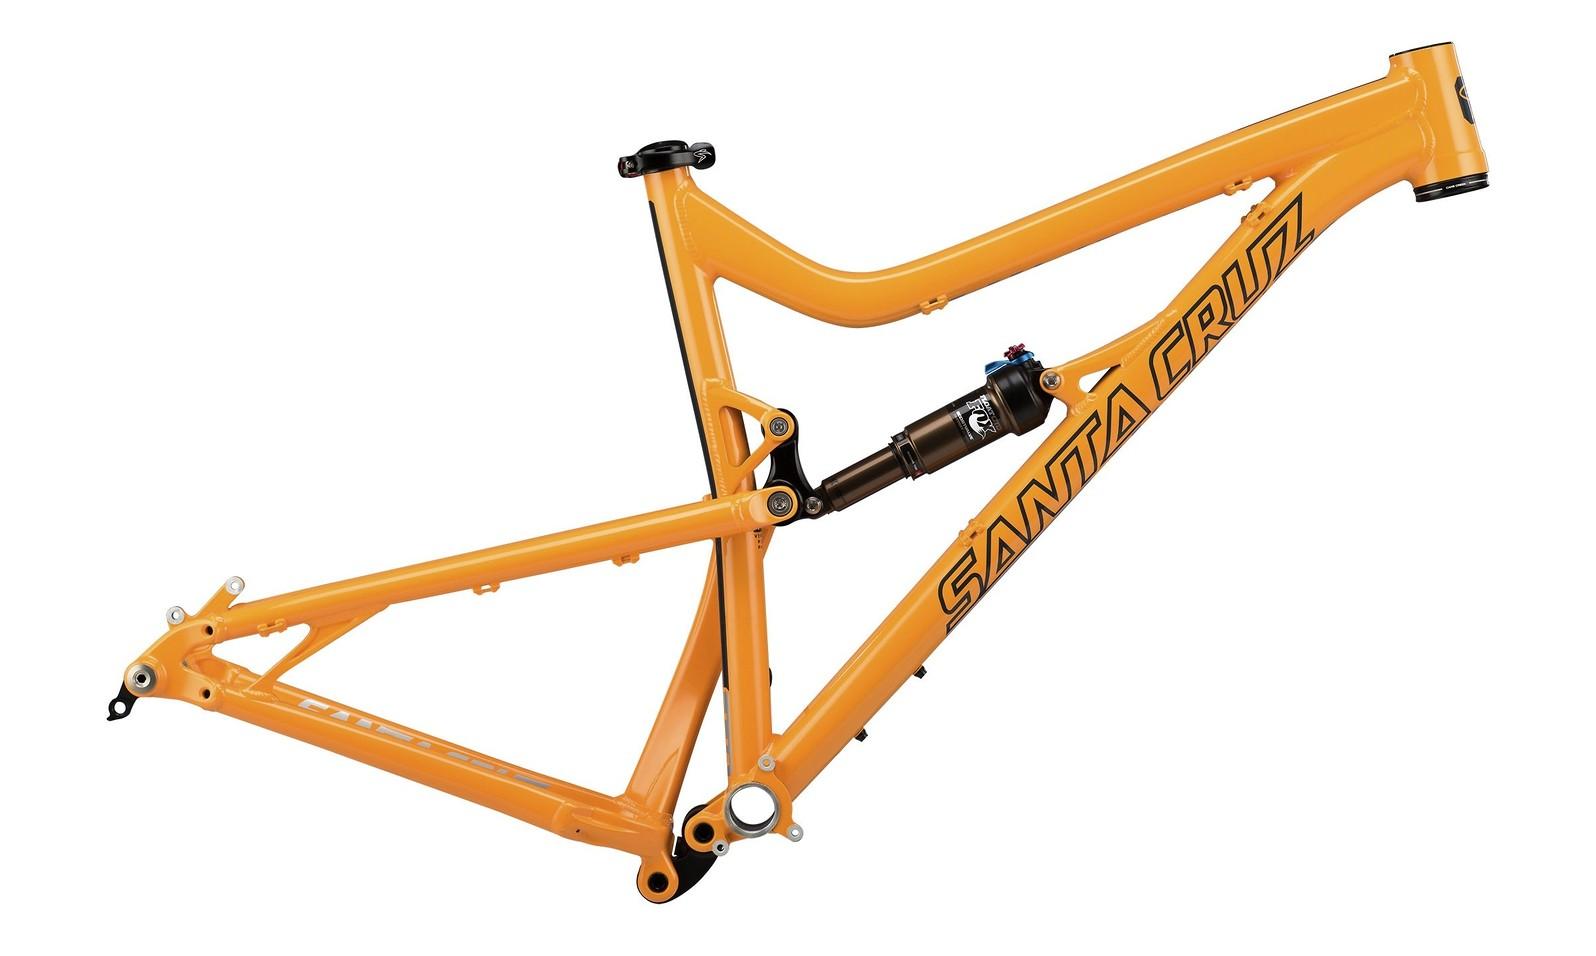 Santa Cruz Tallboy LT Aluminum Frame - Yellow & Gloss Black